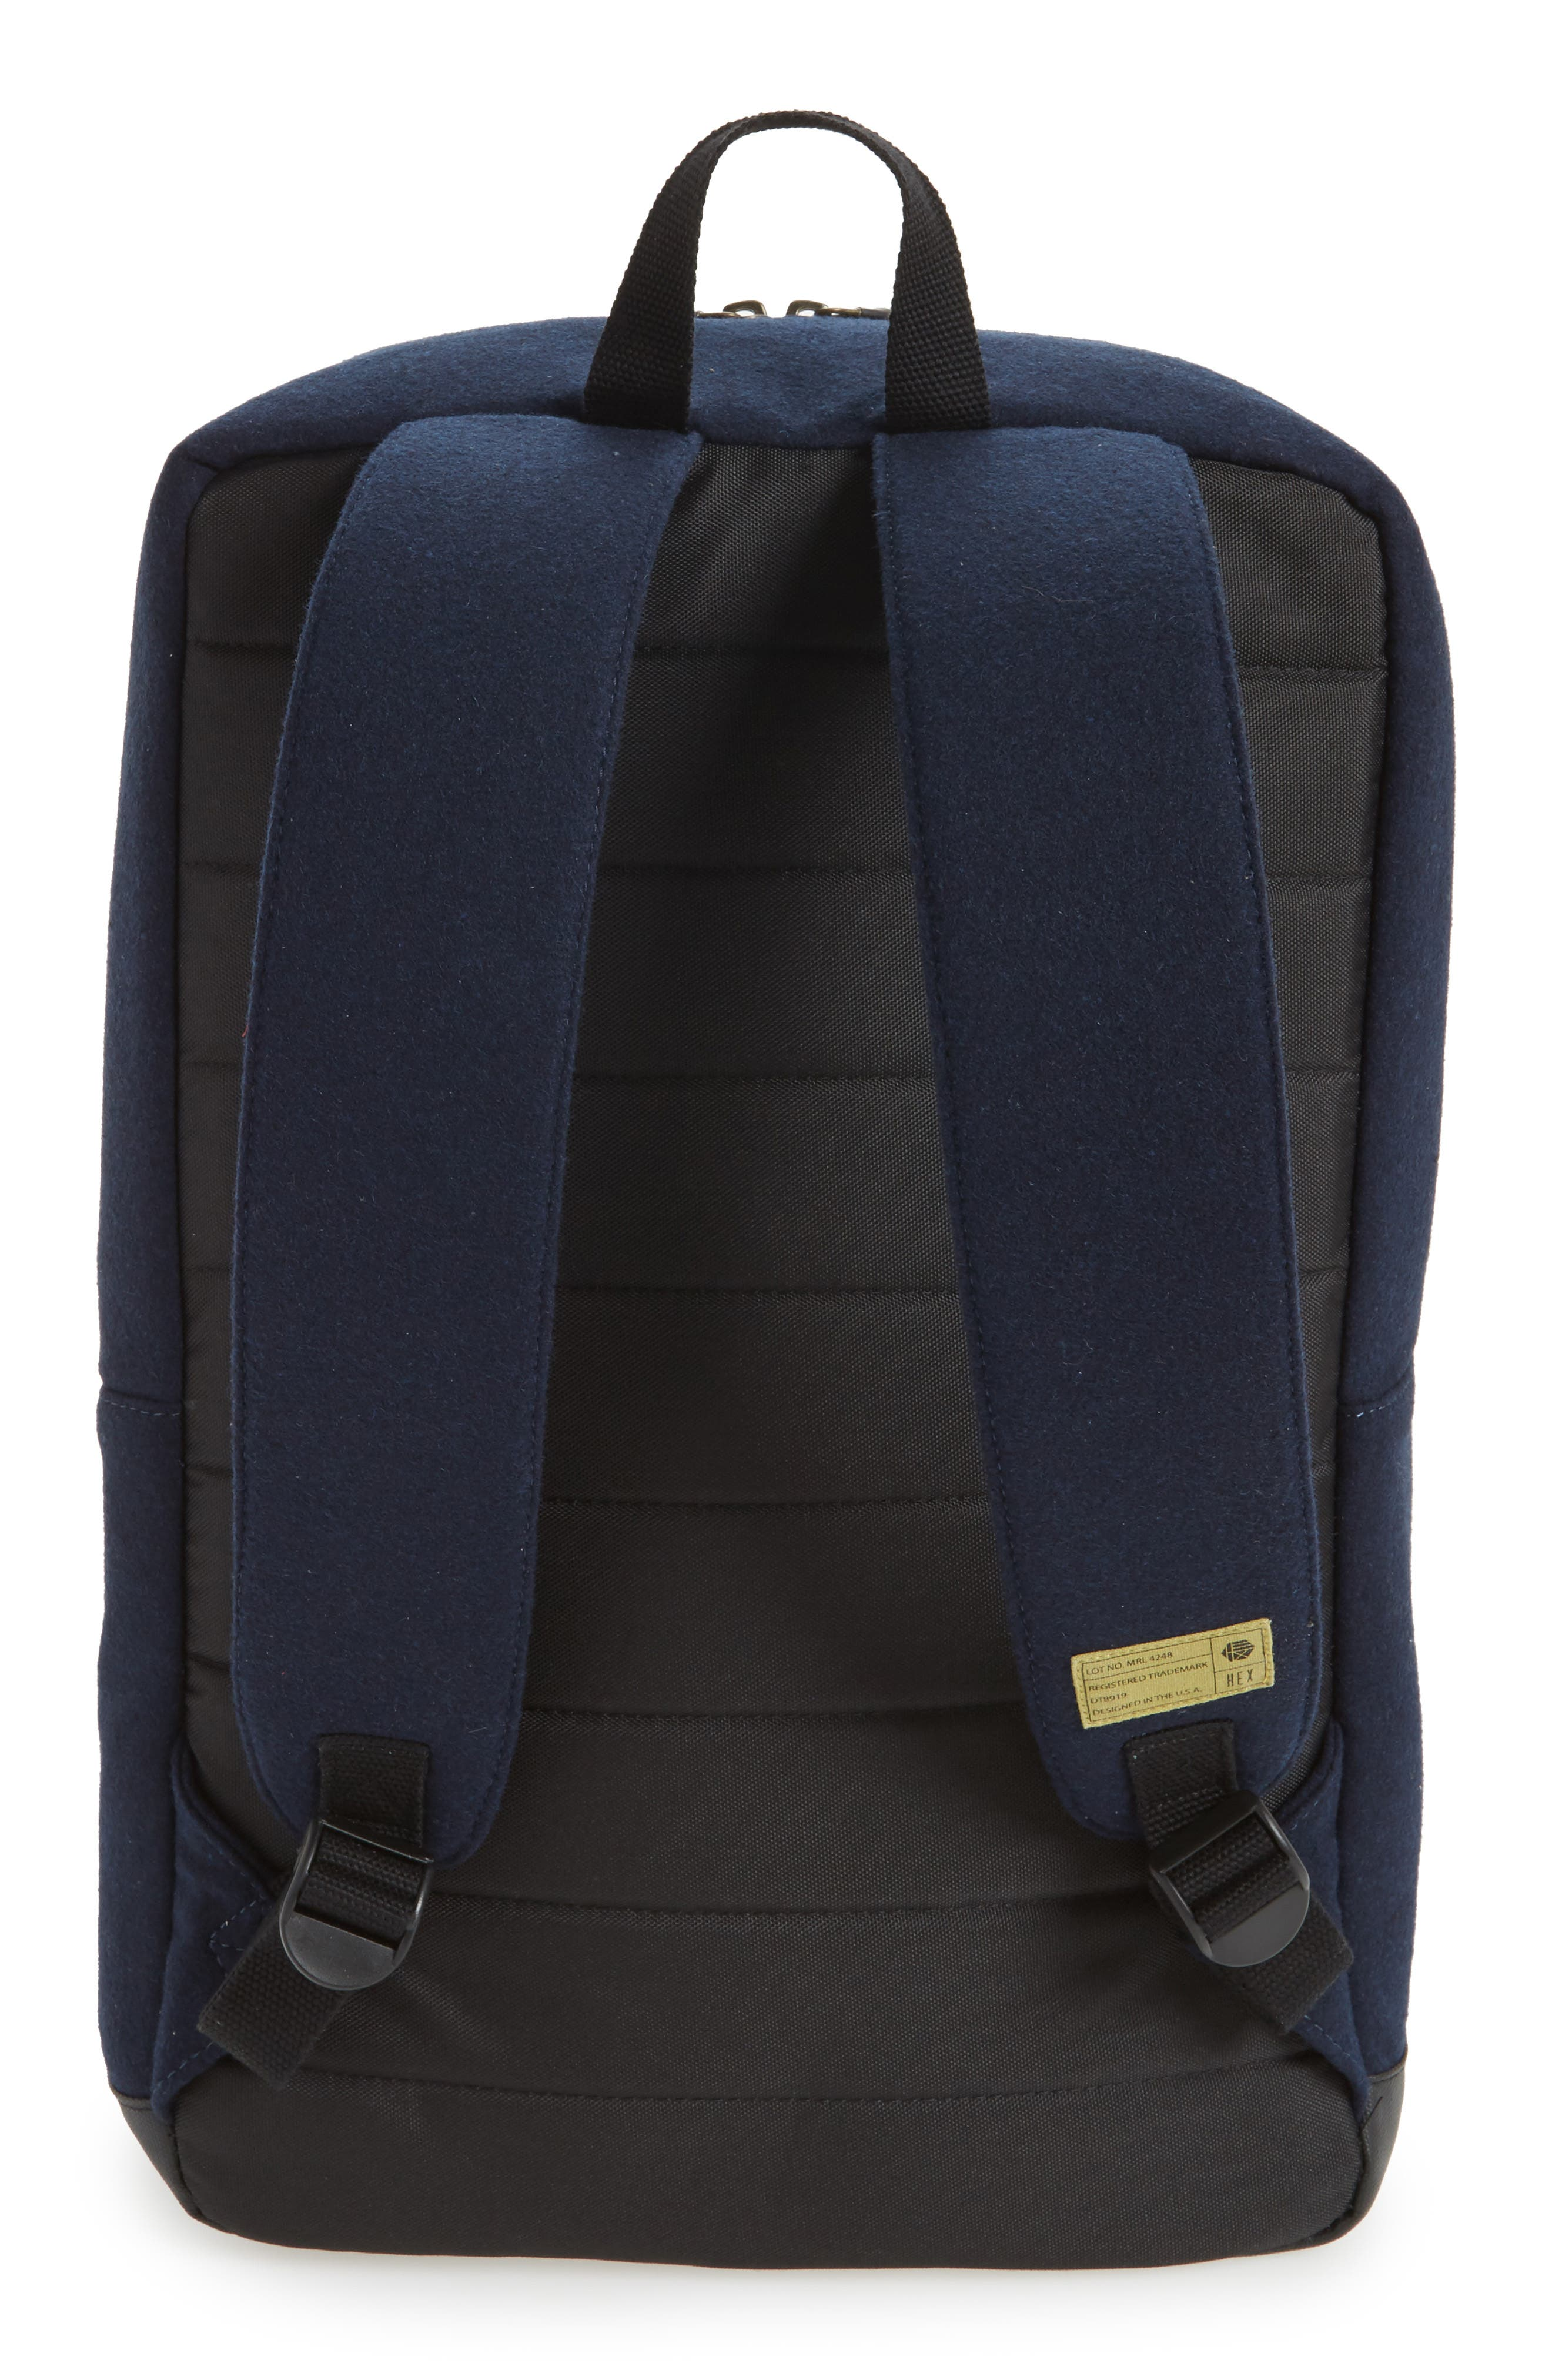 Radar Origin Water Resistant Commuter/Travel Laptop Backpack,                             Alternate thumbnail 3, color,                             410